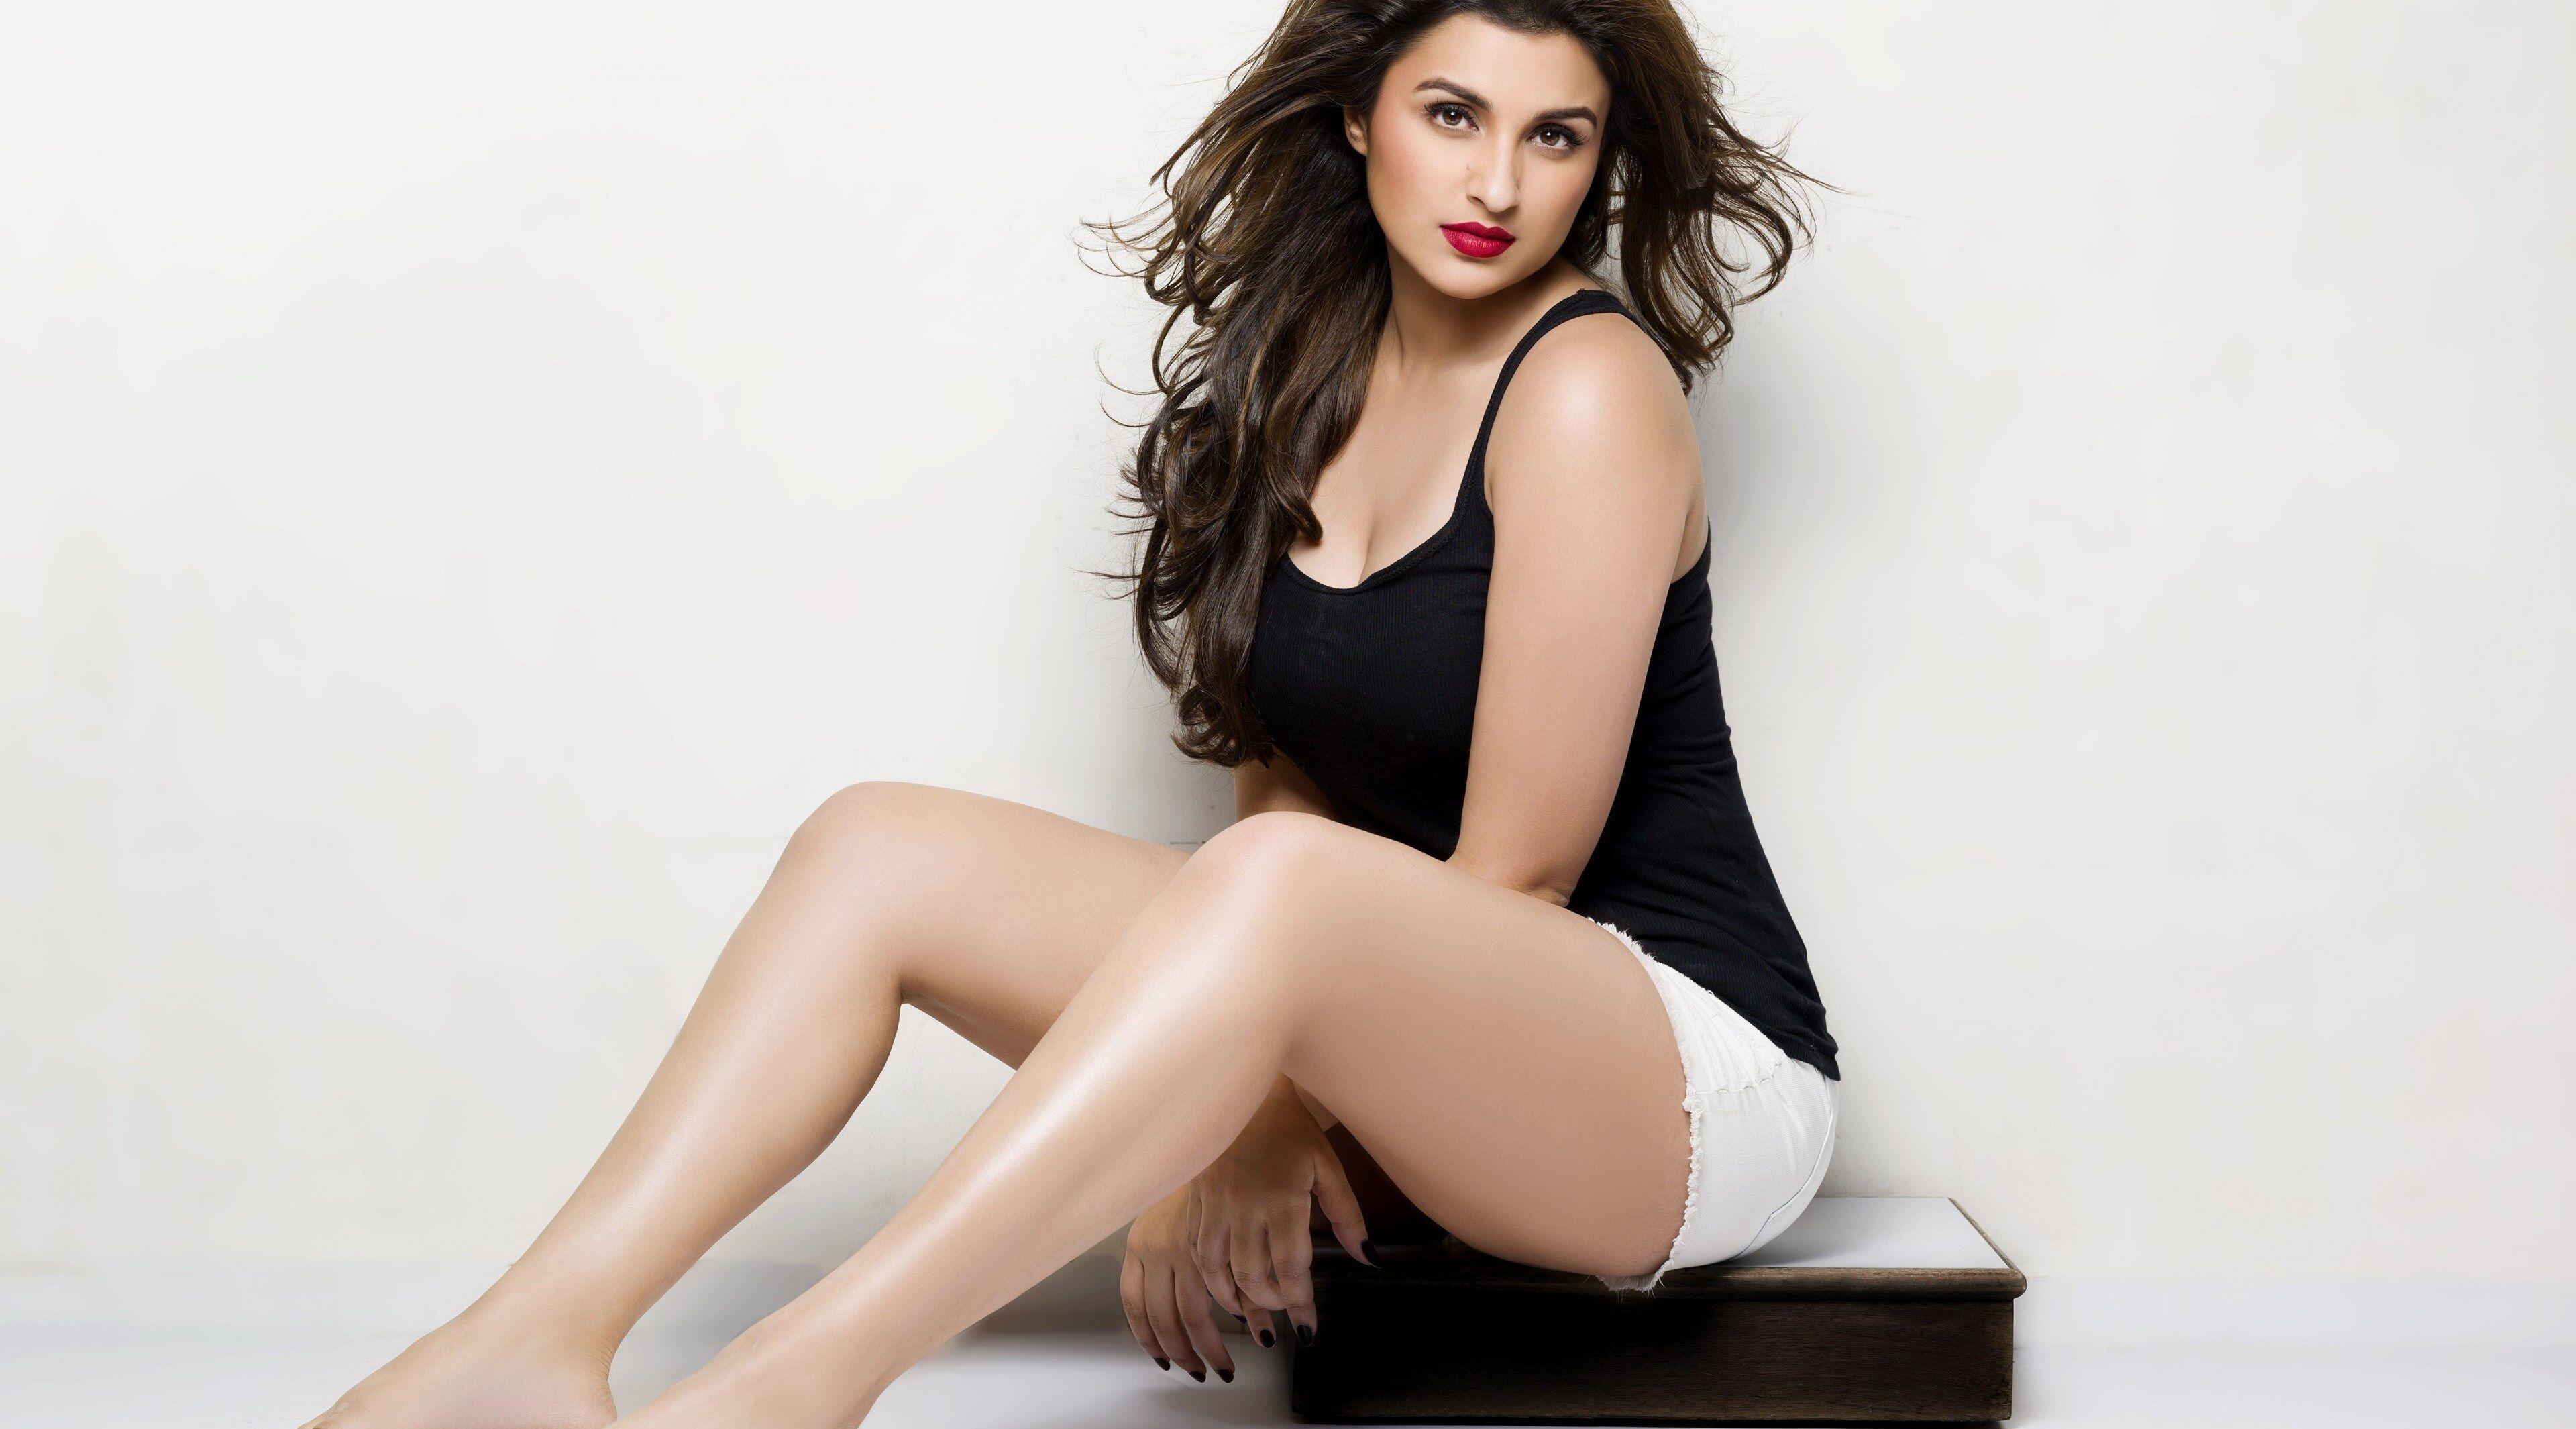 Bollywood actress hot photos sexy bikini pics